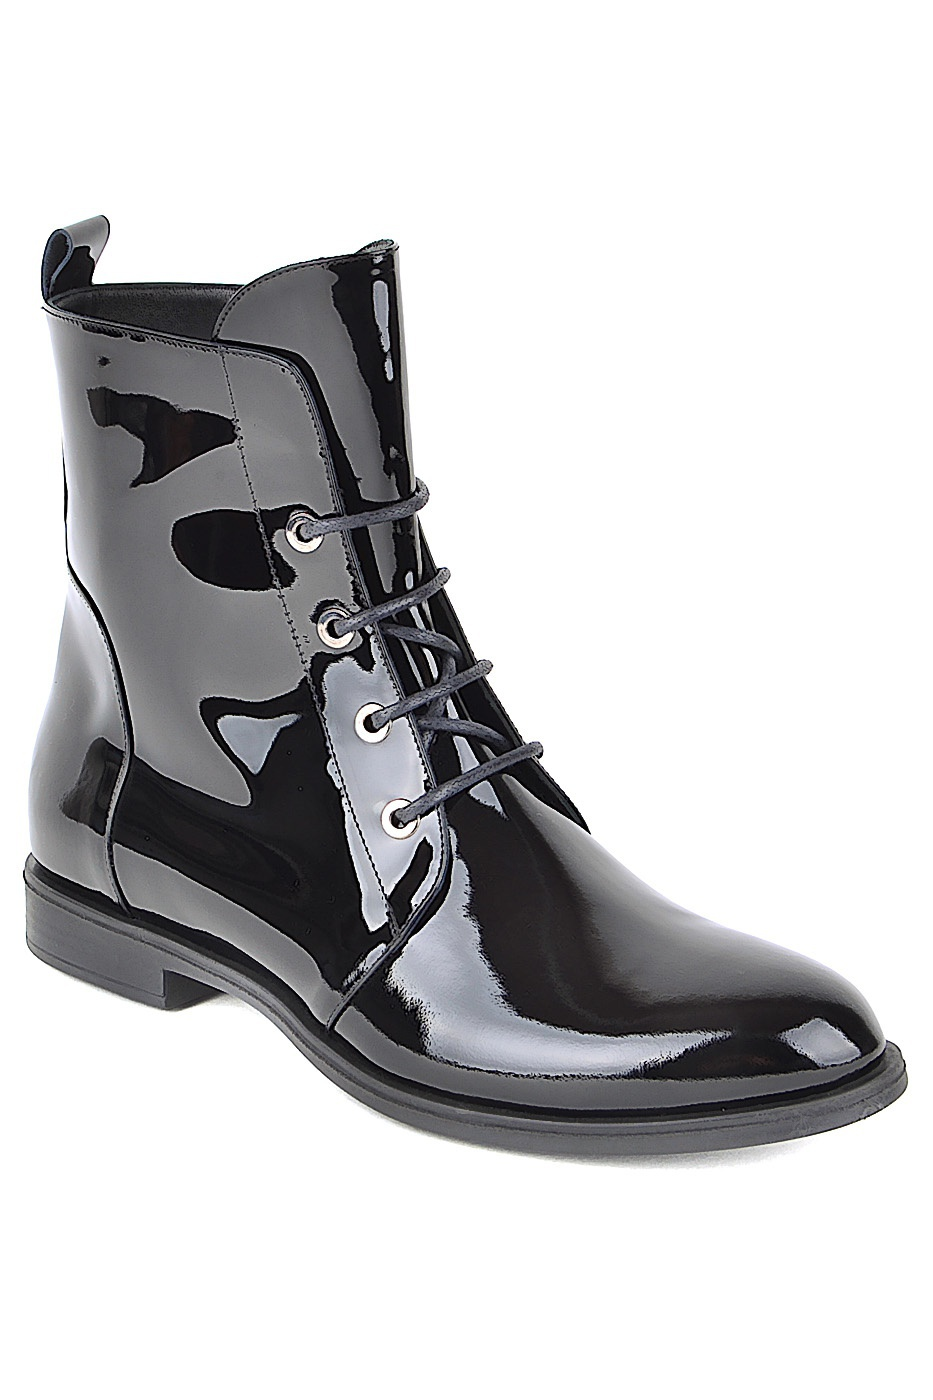 Ботинки Marco Barbabella р.40